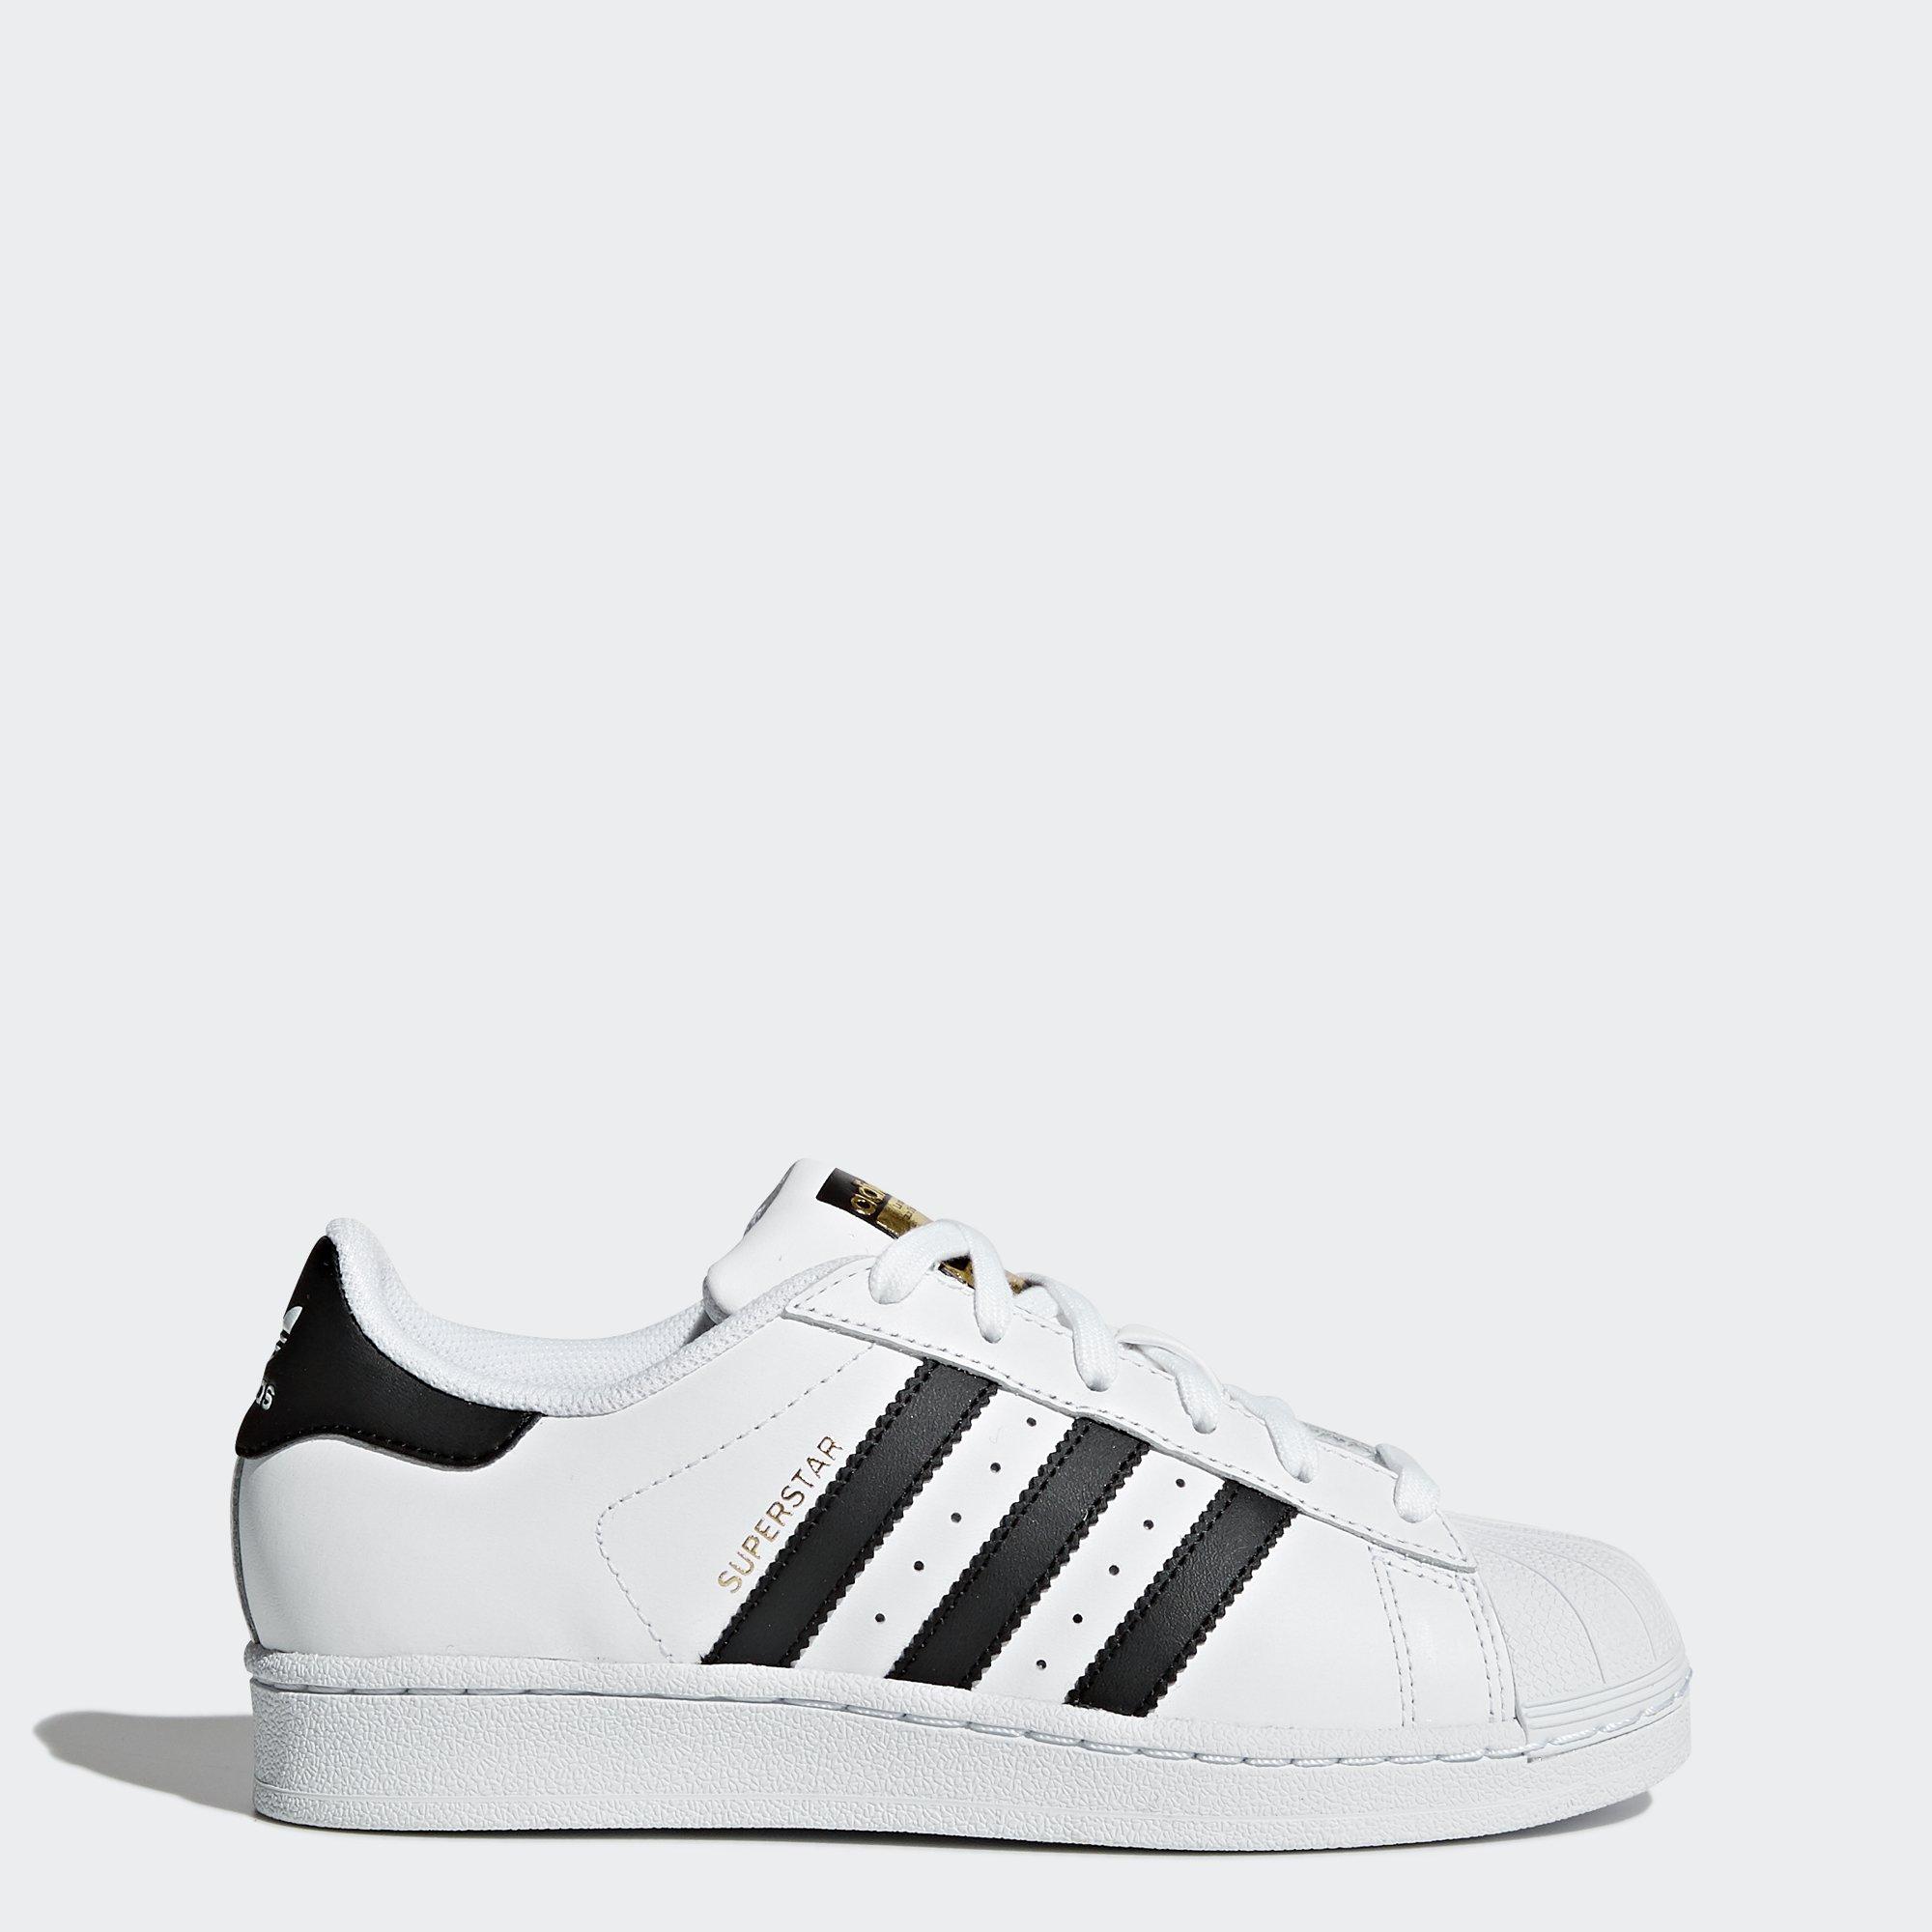 Strona główna :: adidas :: adidas Originals :: Buty Originals :: Buty Superstar